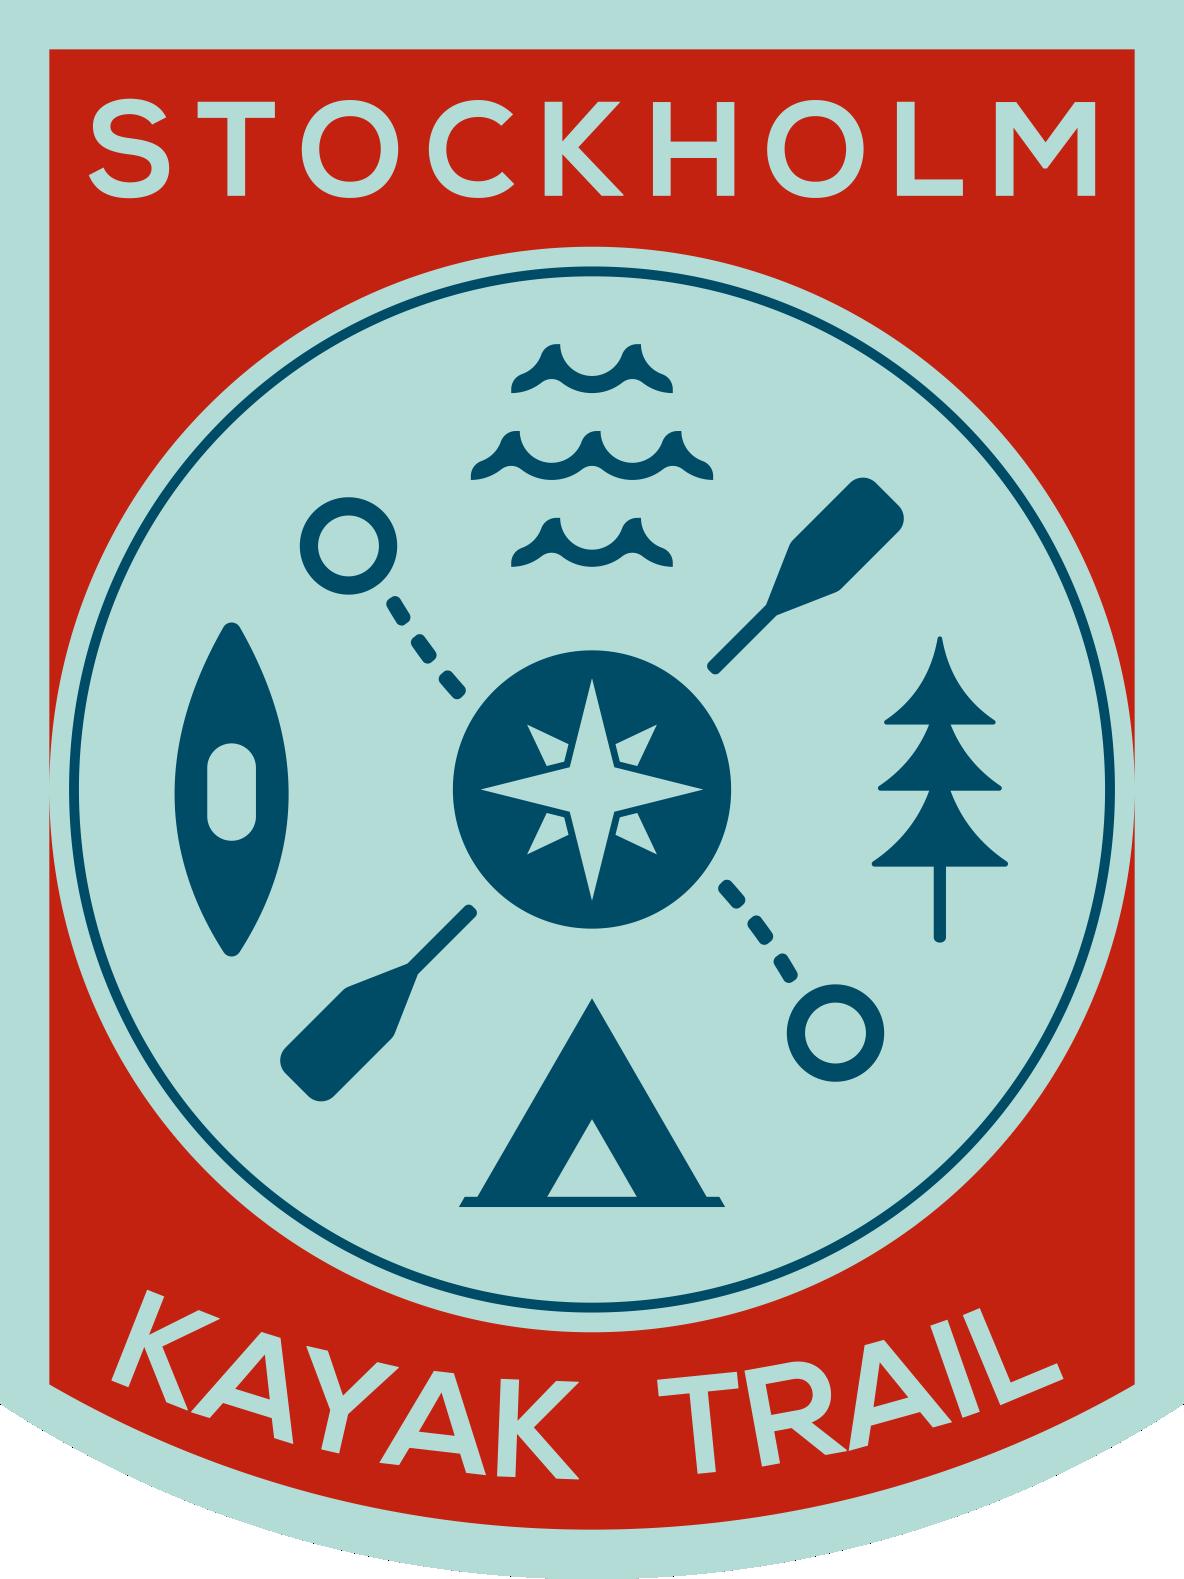 Stockholms Kajakled Logotyp